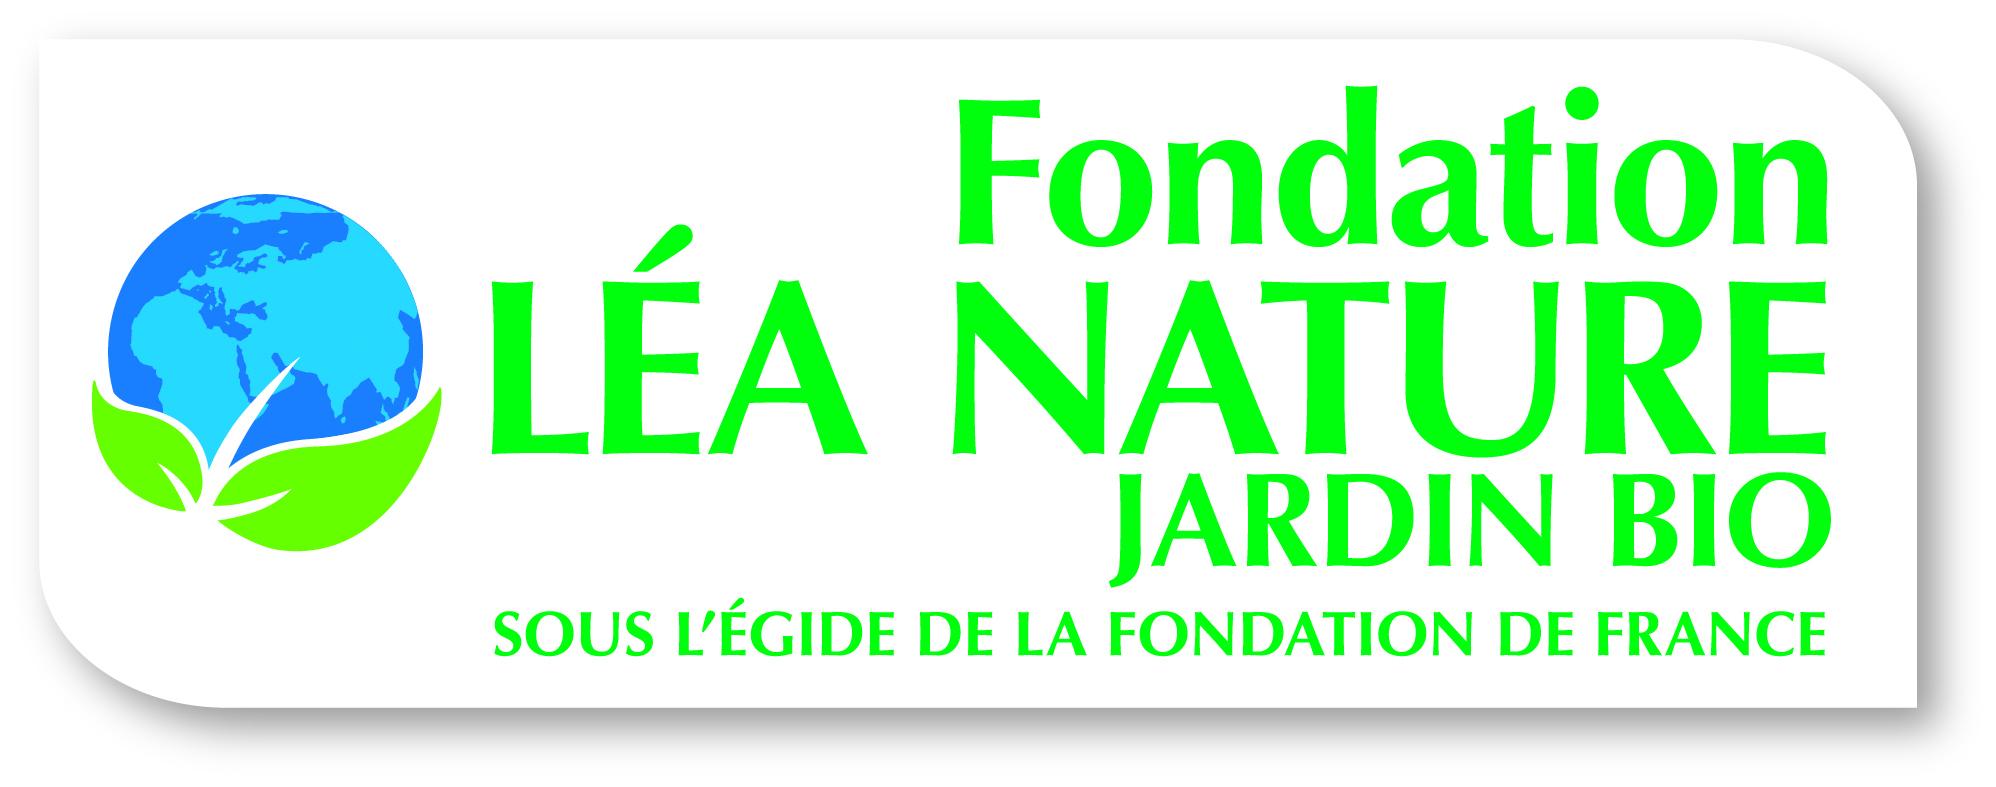 FONDATION LÉA NATURE JARDIN BIO